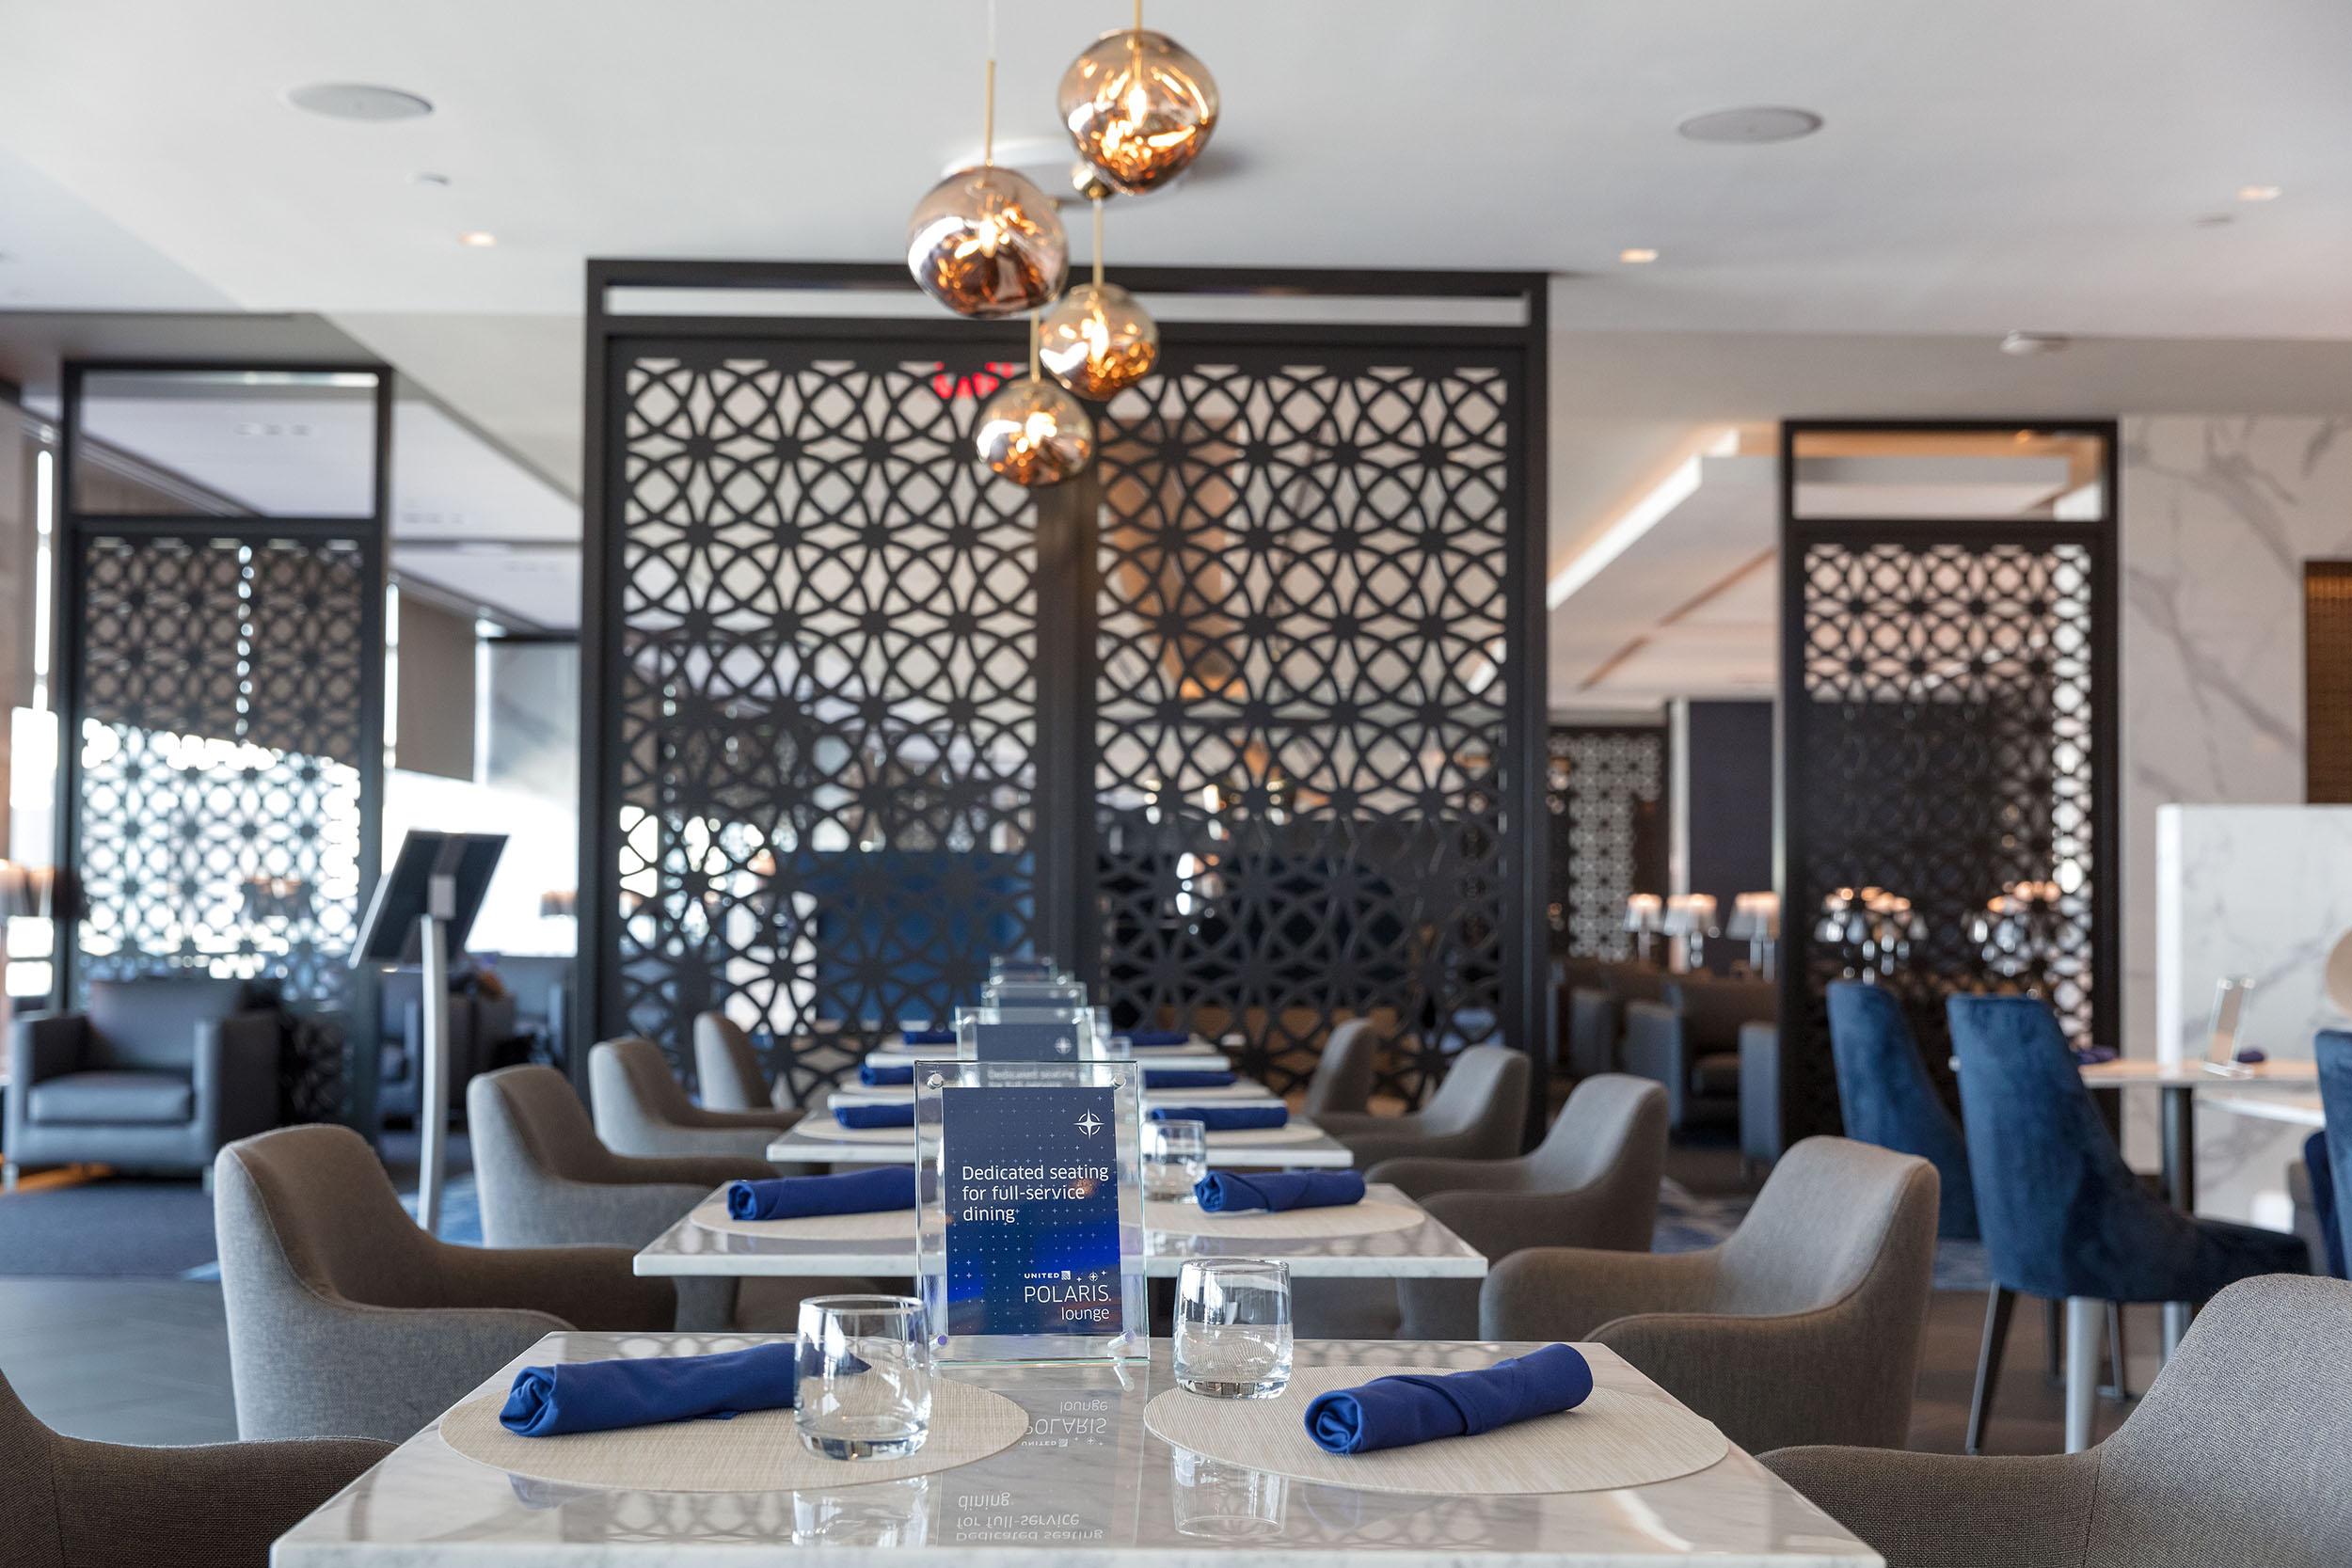 United Polaris lounge Dining Room at EWR